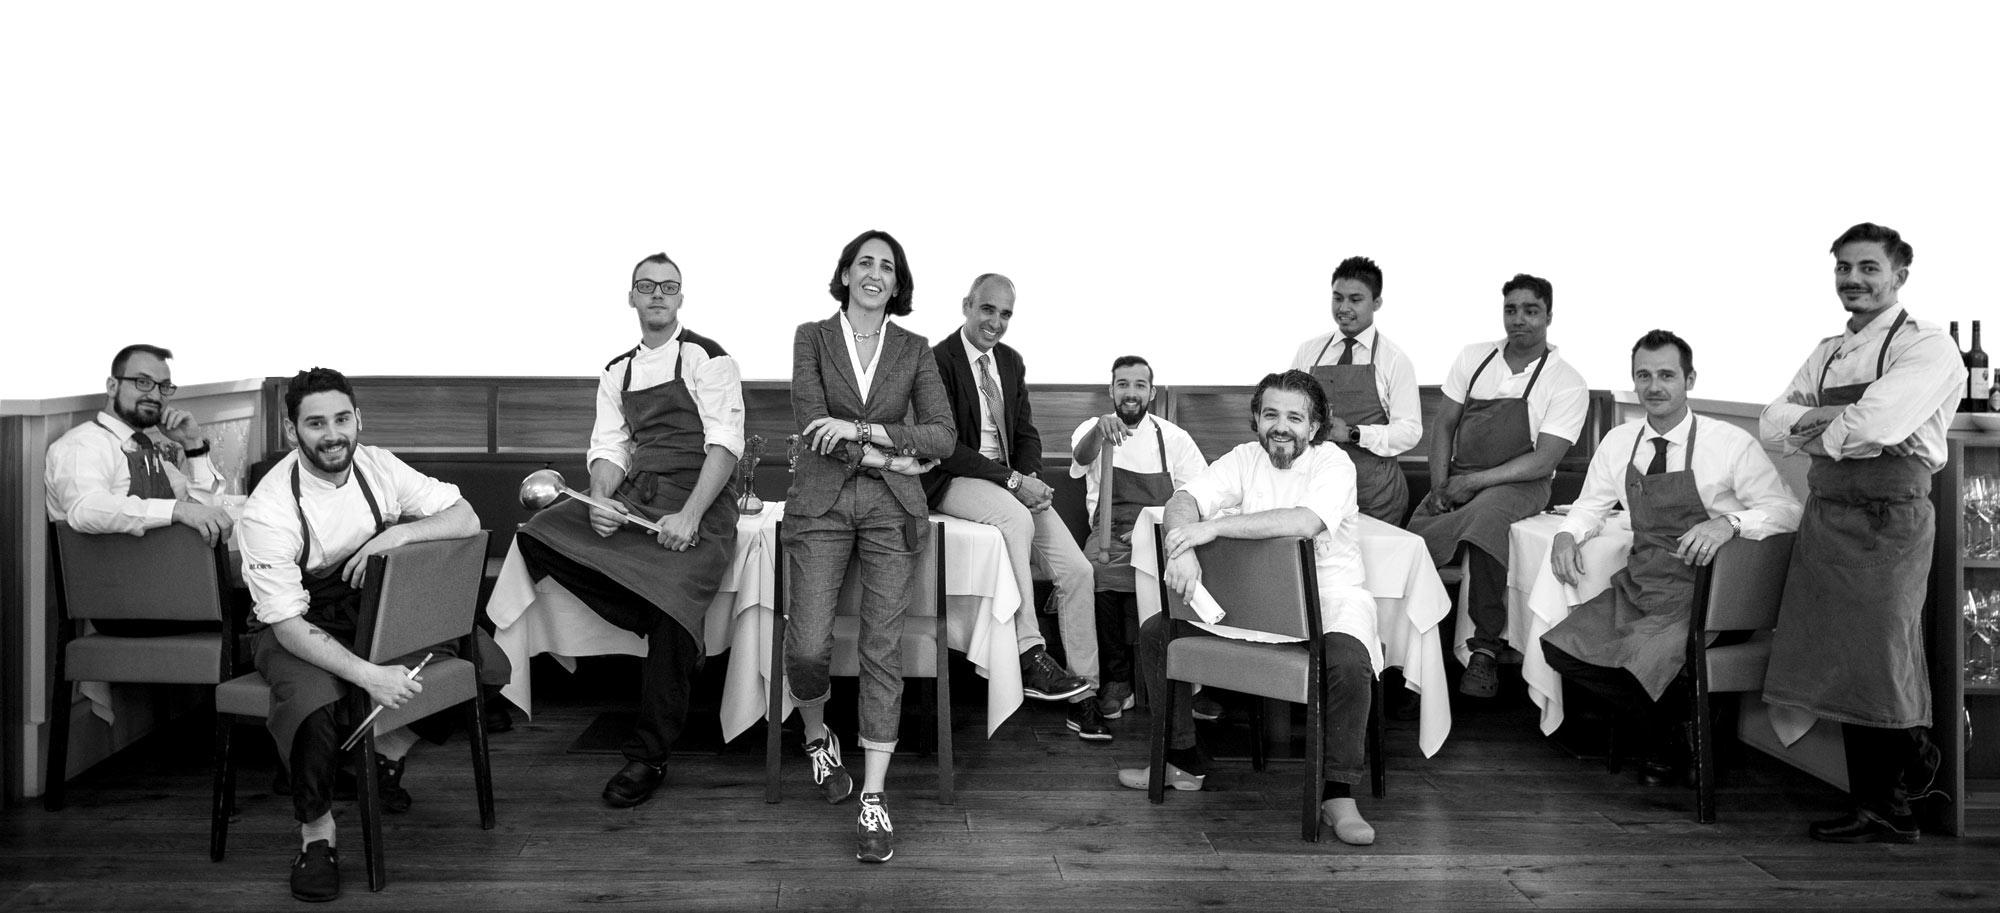 team2 - In Viaggio - Claudio Melis Ristorante